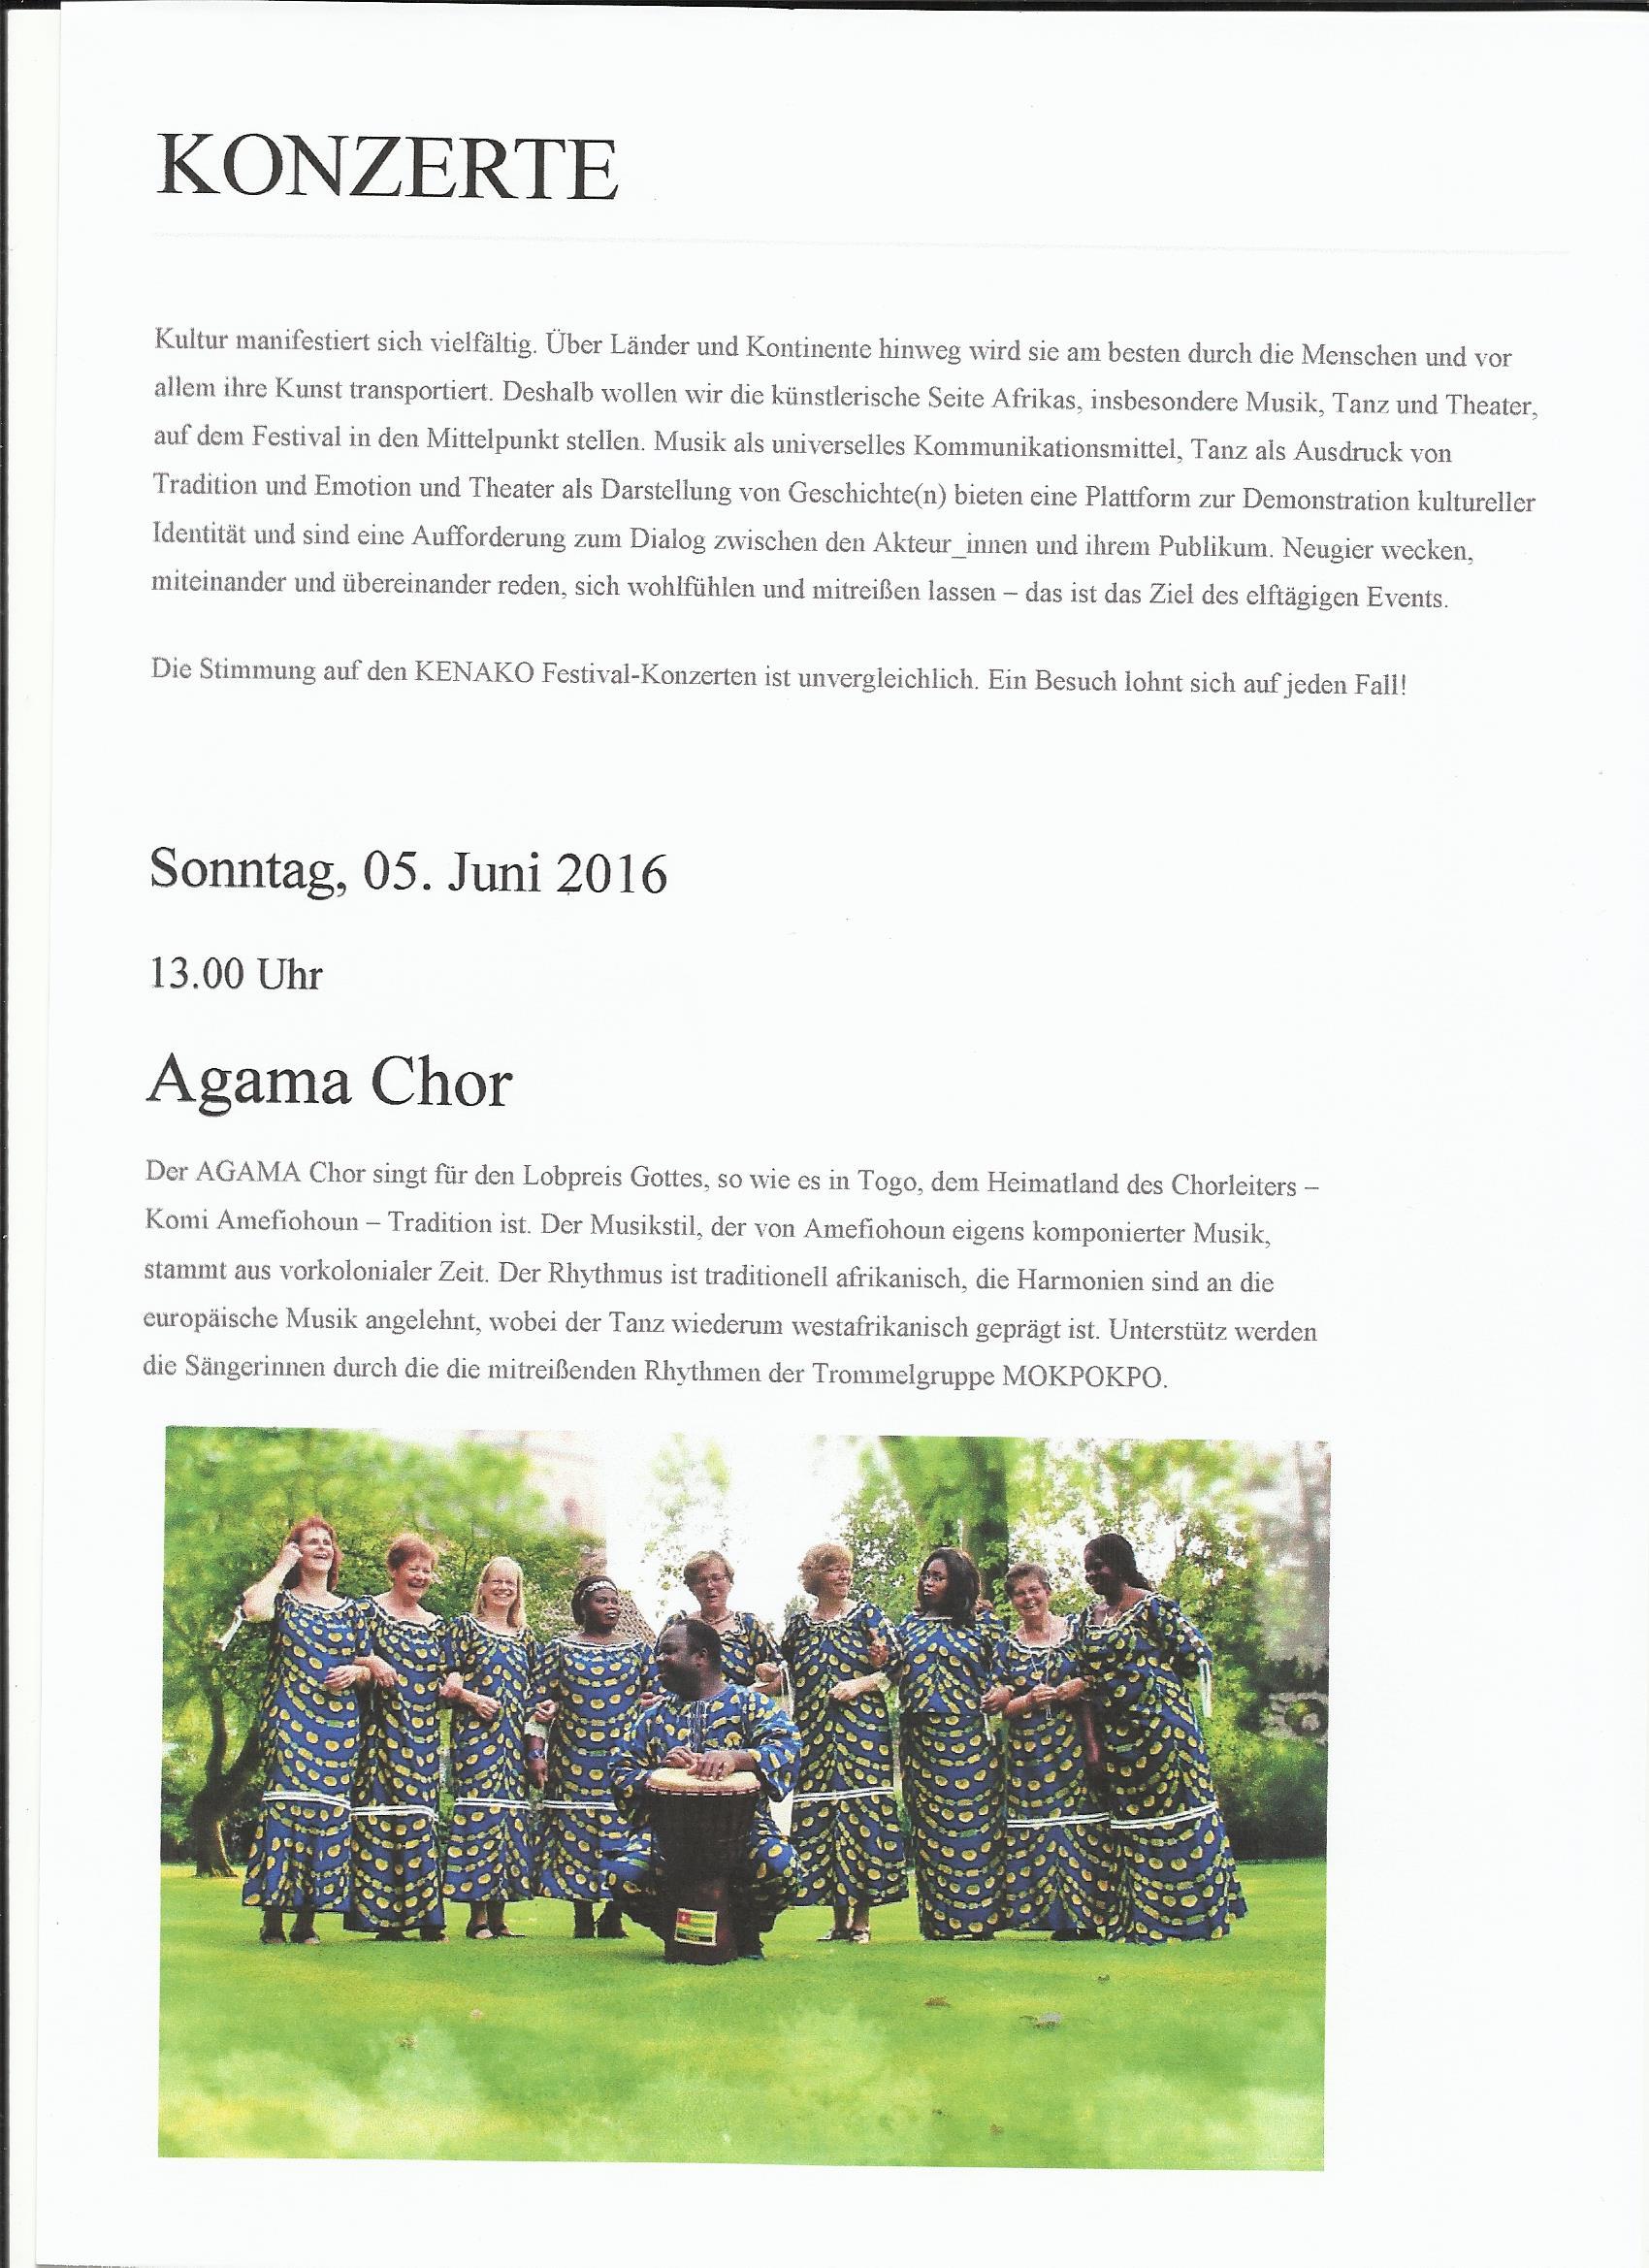 Vorankündigung - Konzert am 5. Juni 2016 Beim KeNaKo-Festival i